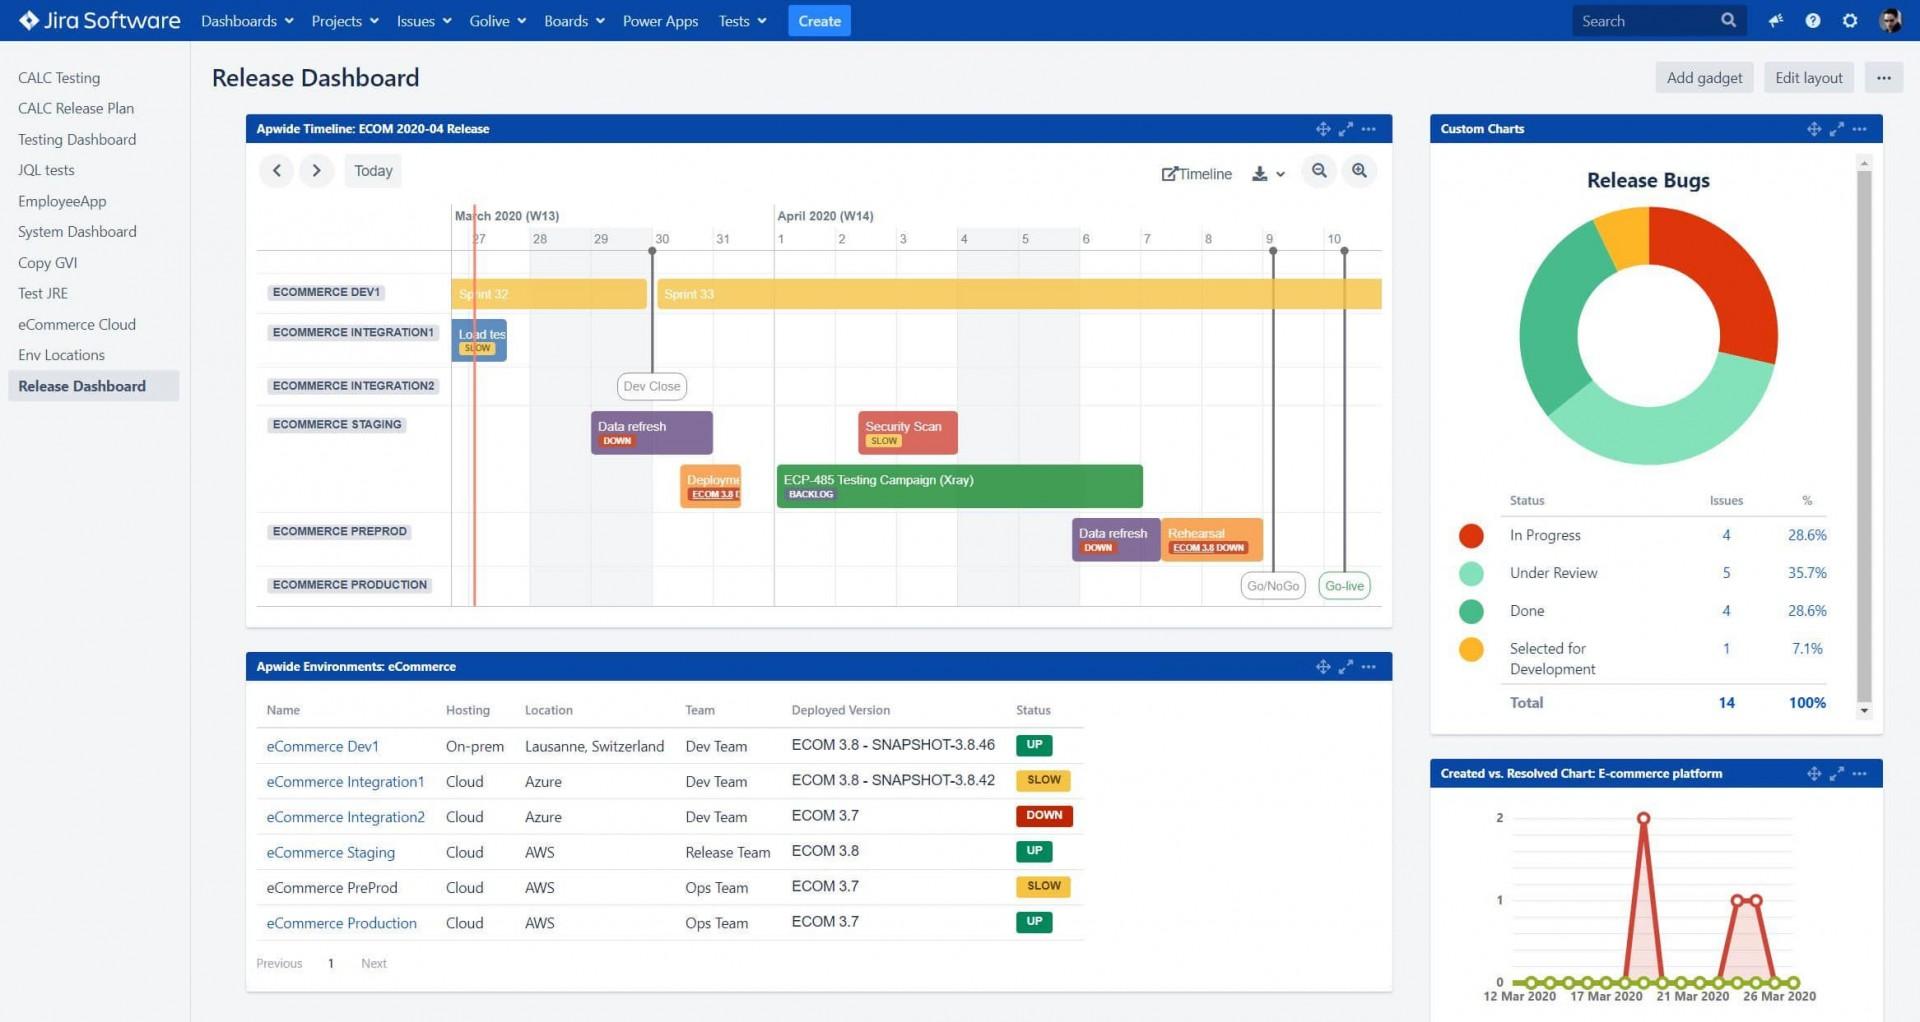 006 Top Project Management Statu Report Template Excel Inspiration  Gantt 2016 Progres1920